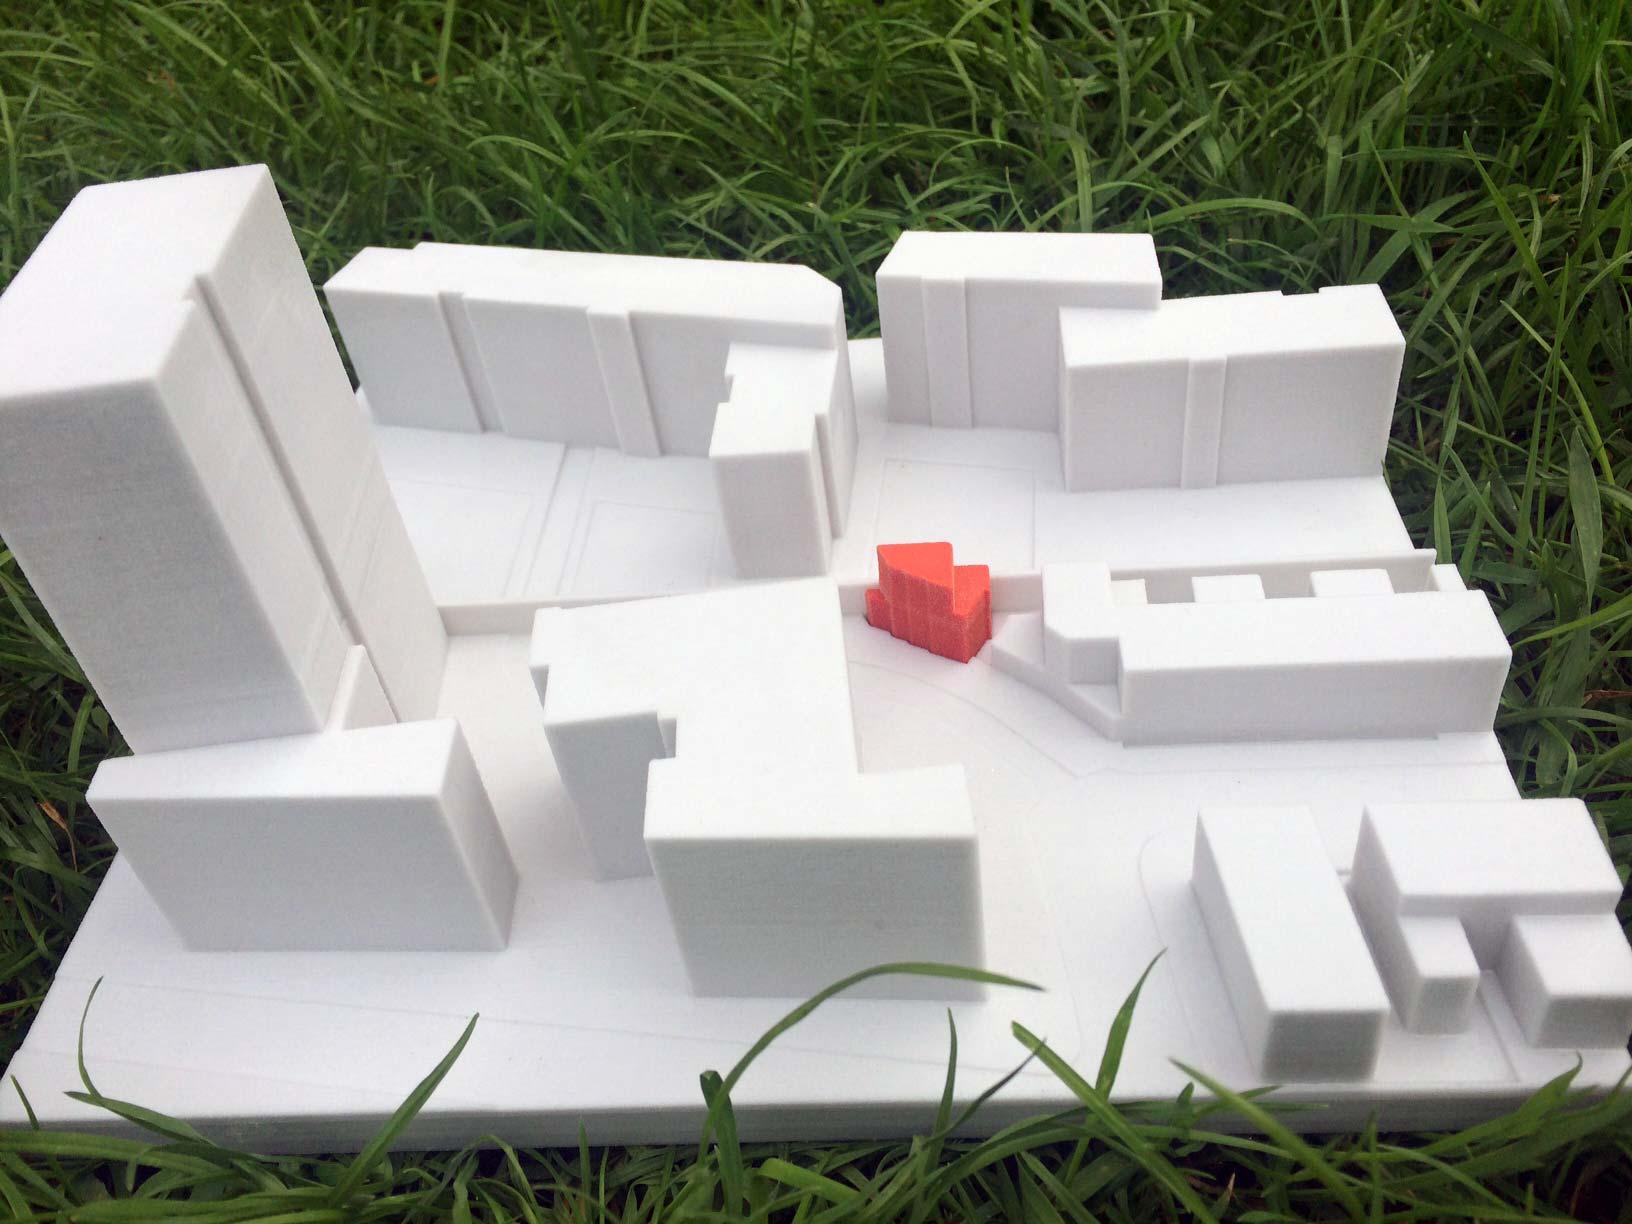 3D Print Image